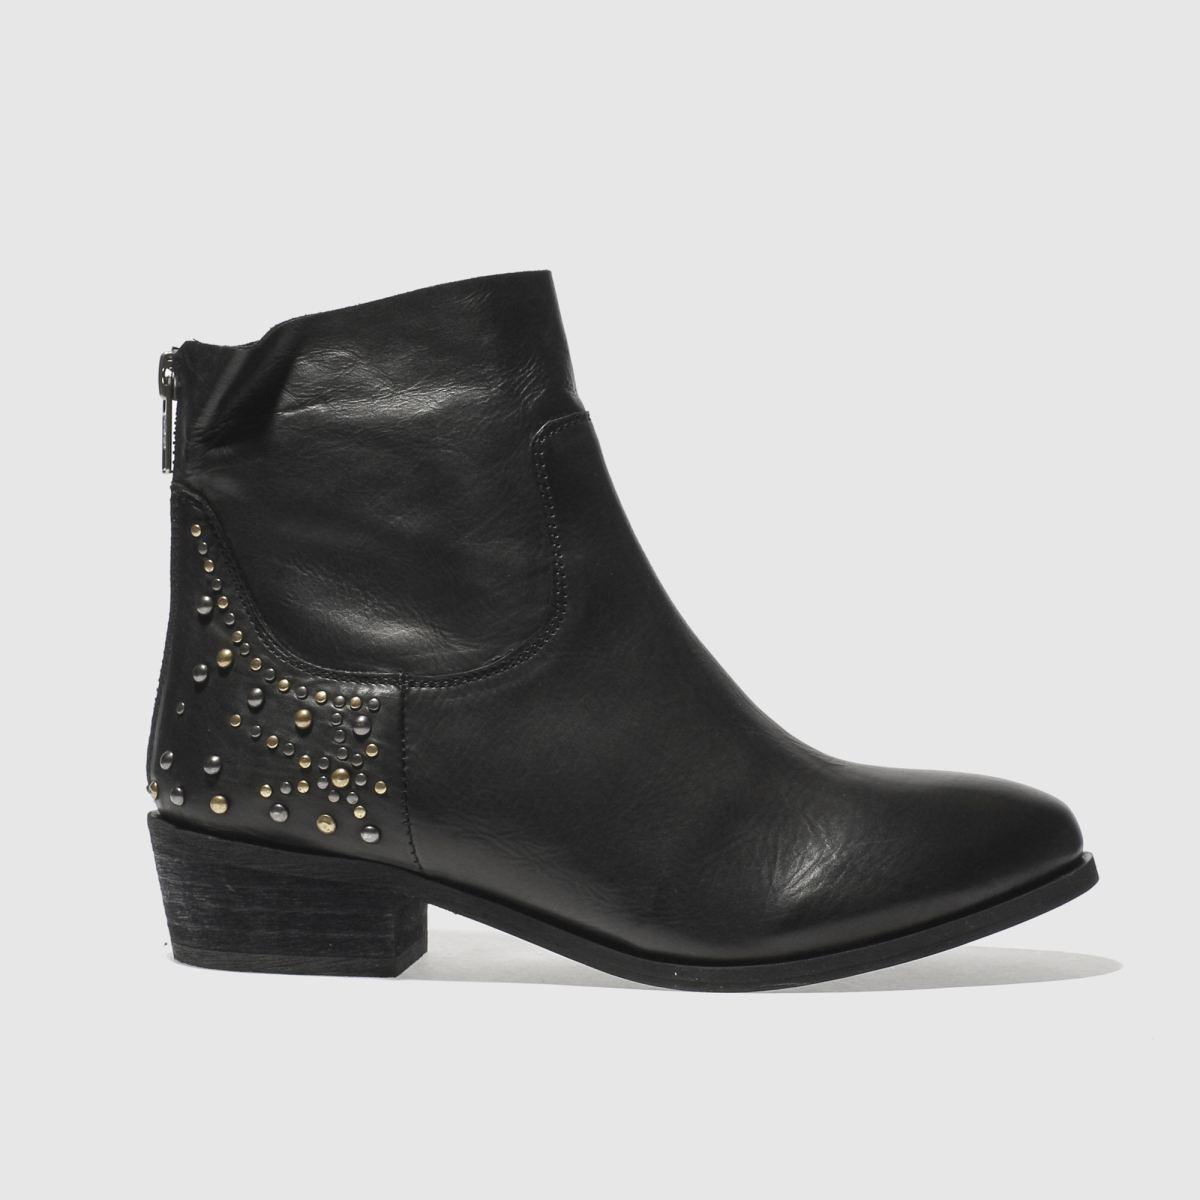 Schuh Black Galactic Boots